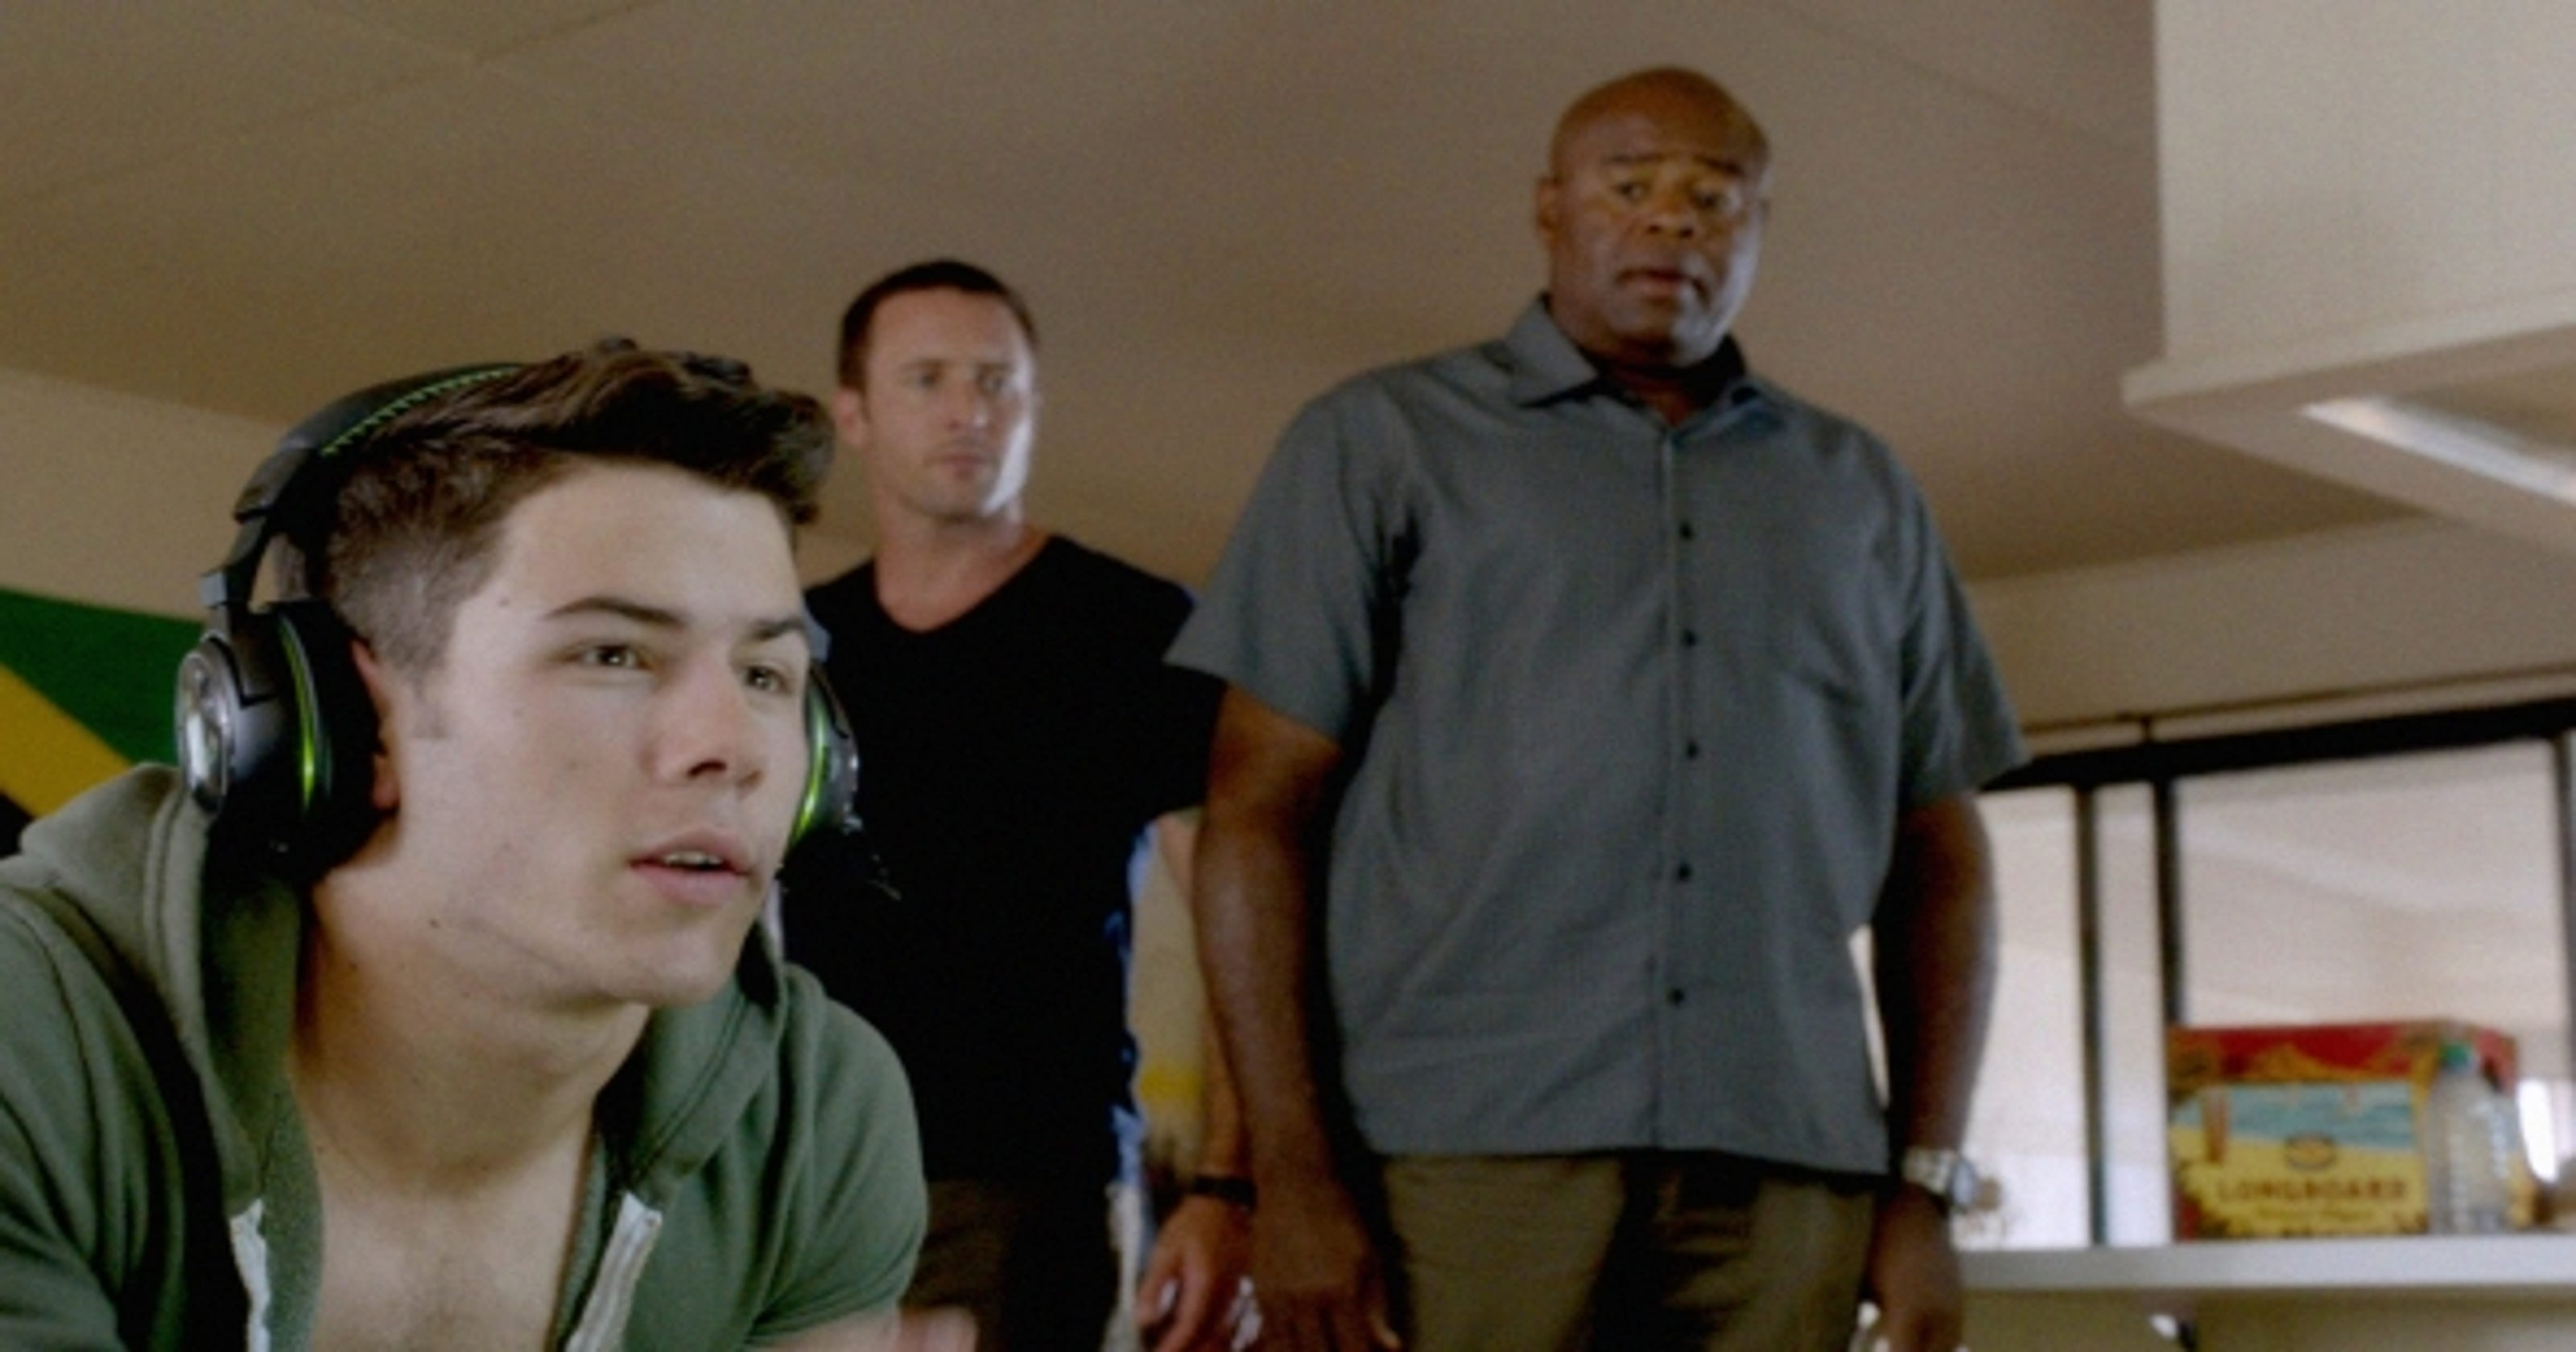 Hawaii Five-0 (2010 TV series, season 9) - Wikipedia